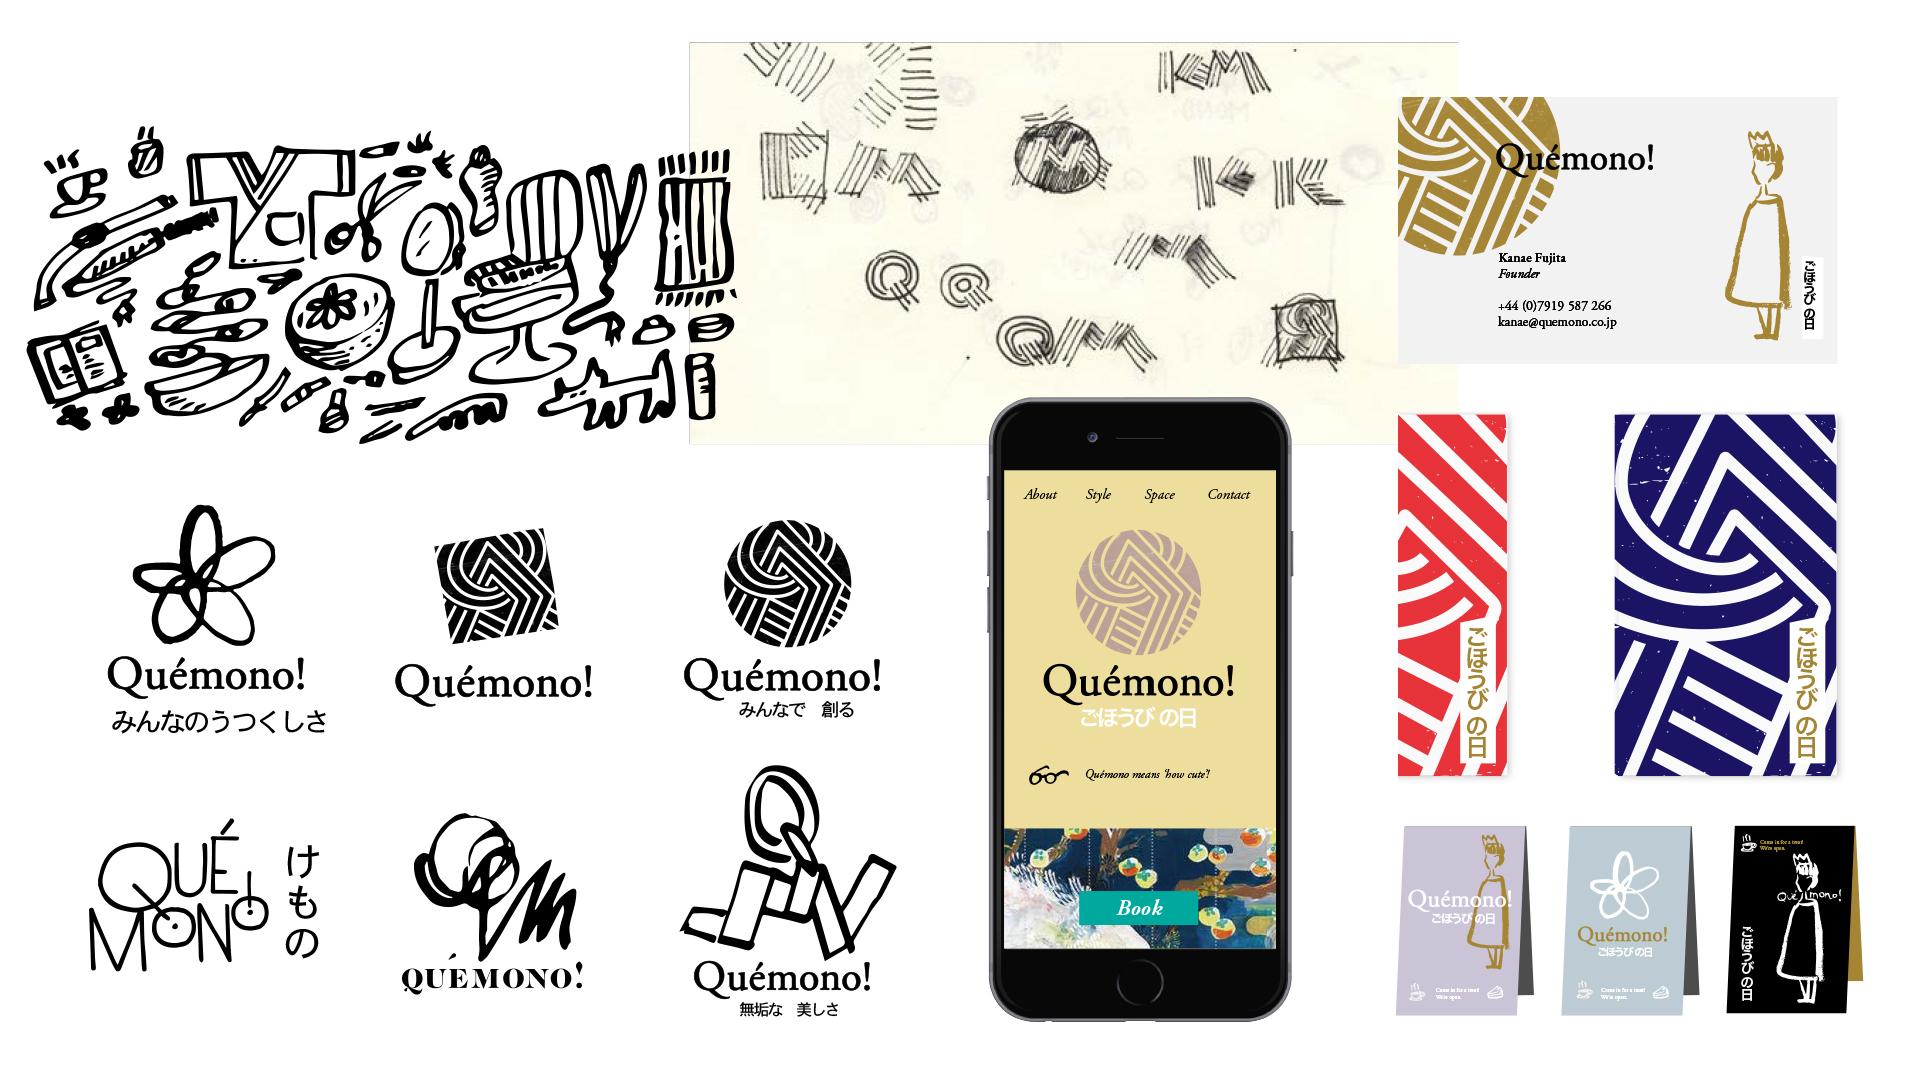 Quemono-for-web-3.jpg